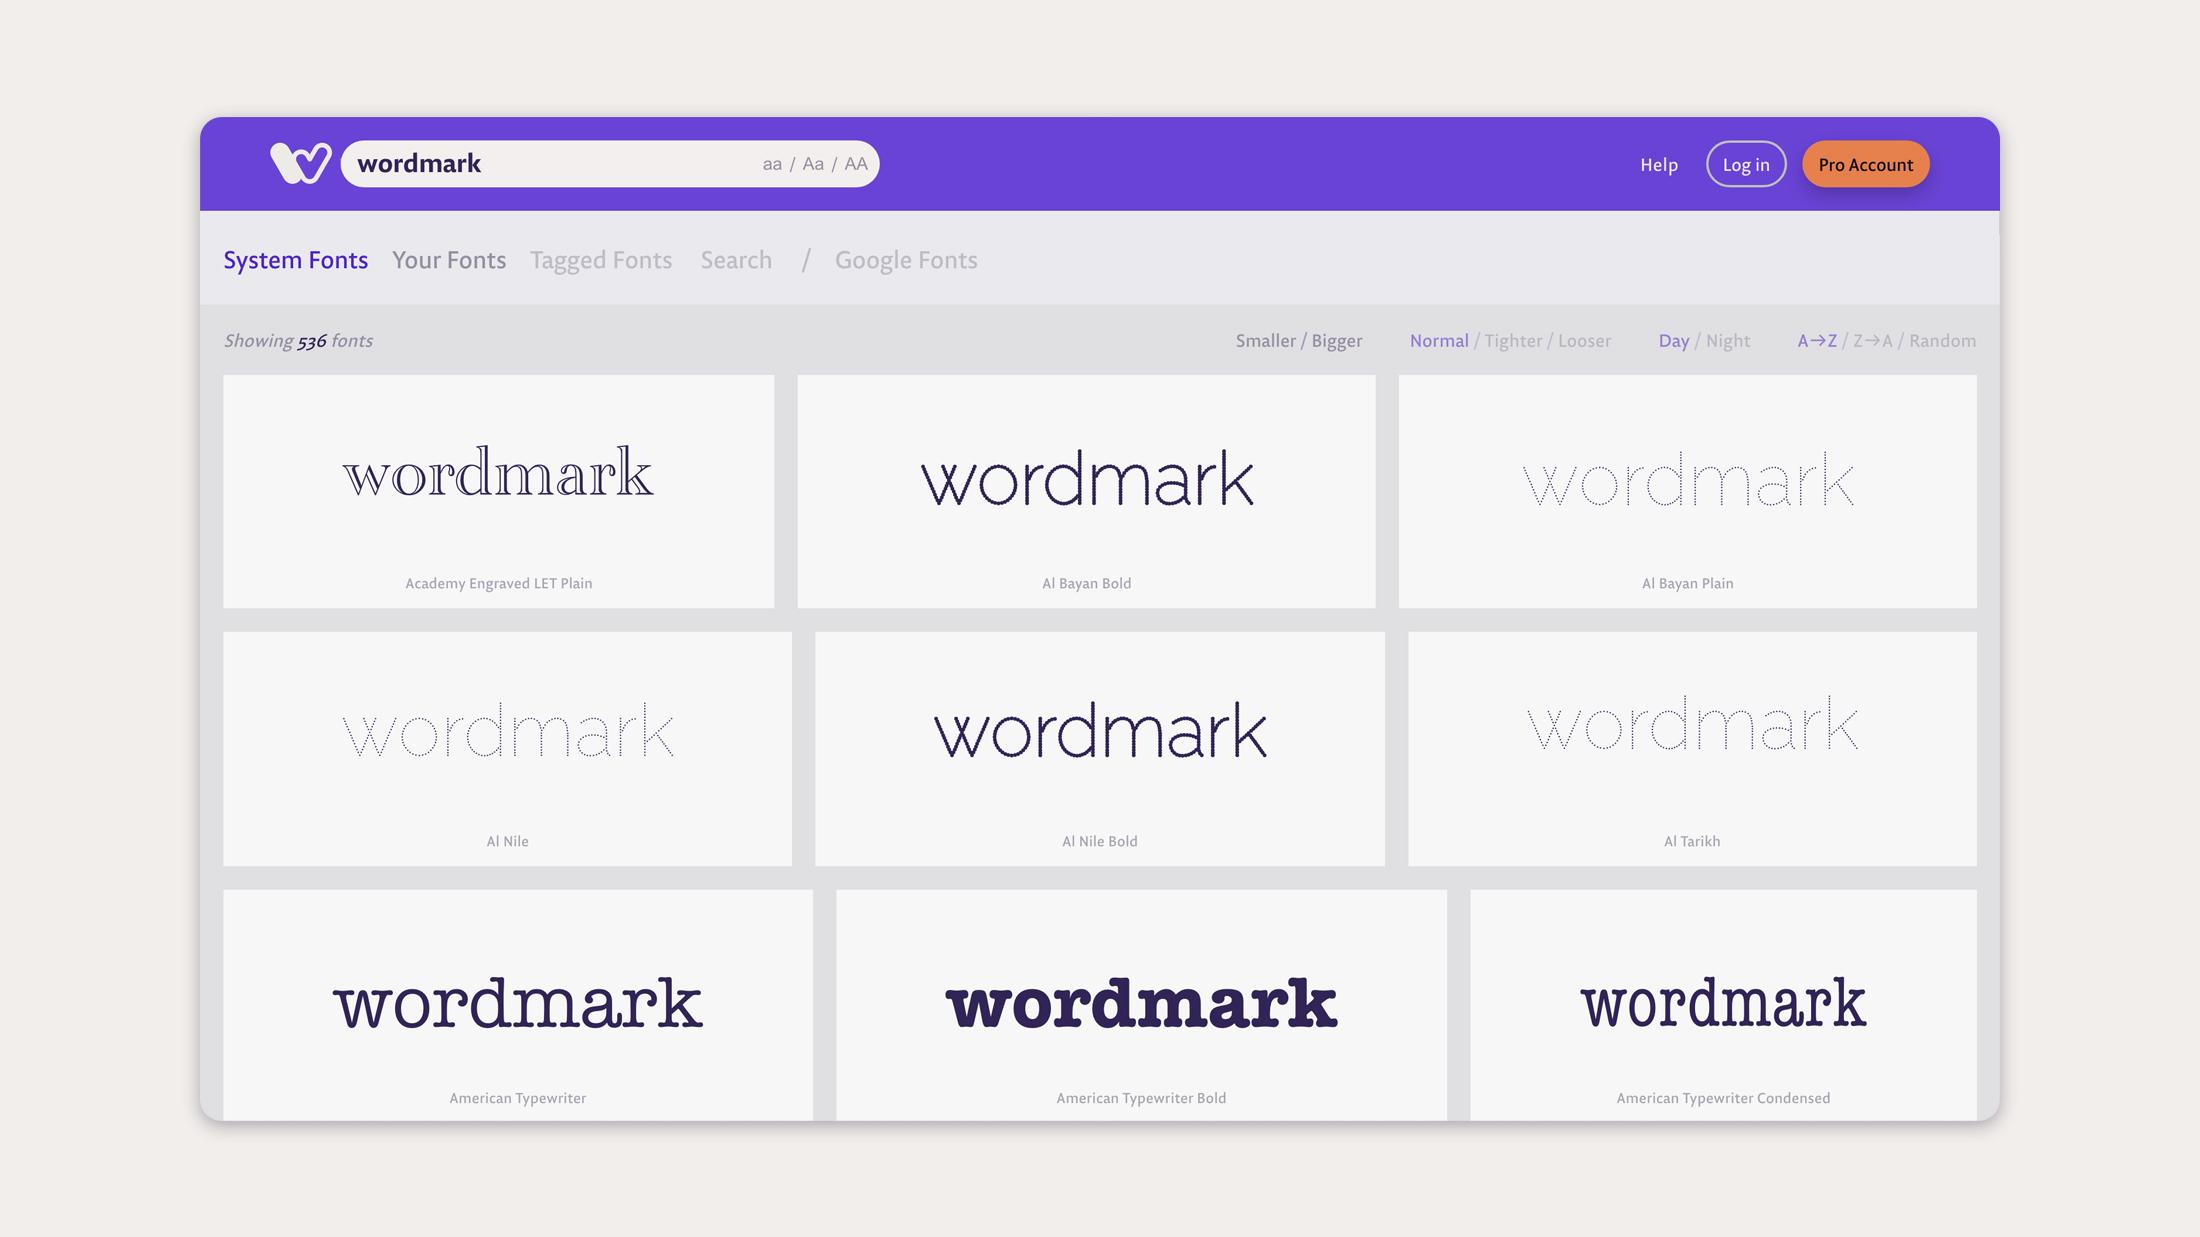 wordmark_images06b